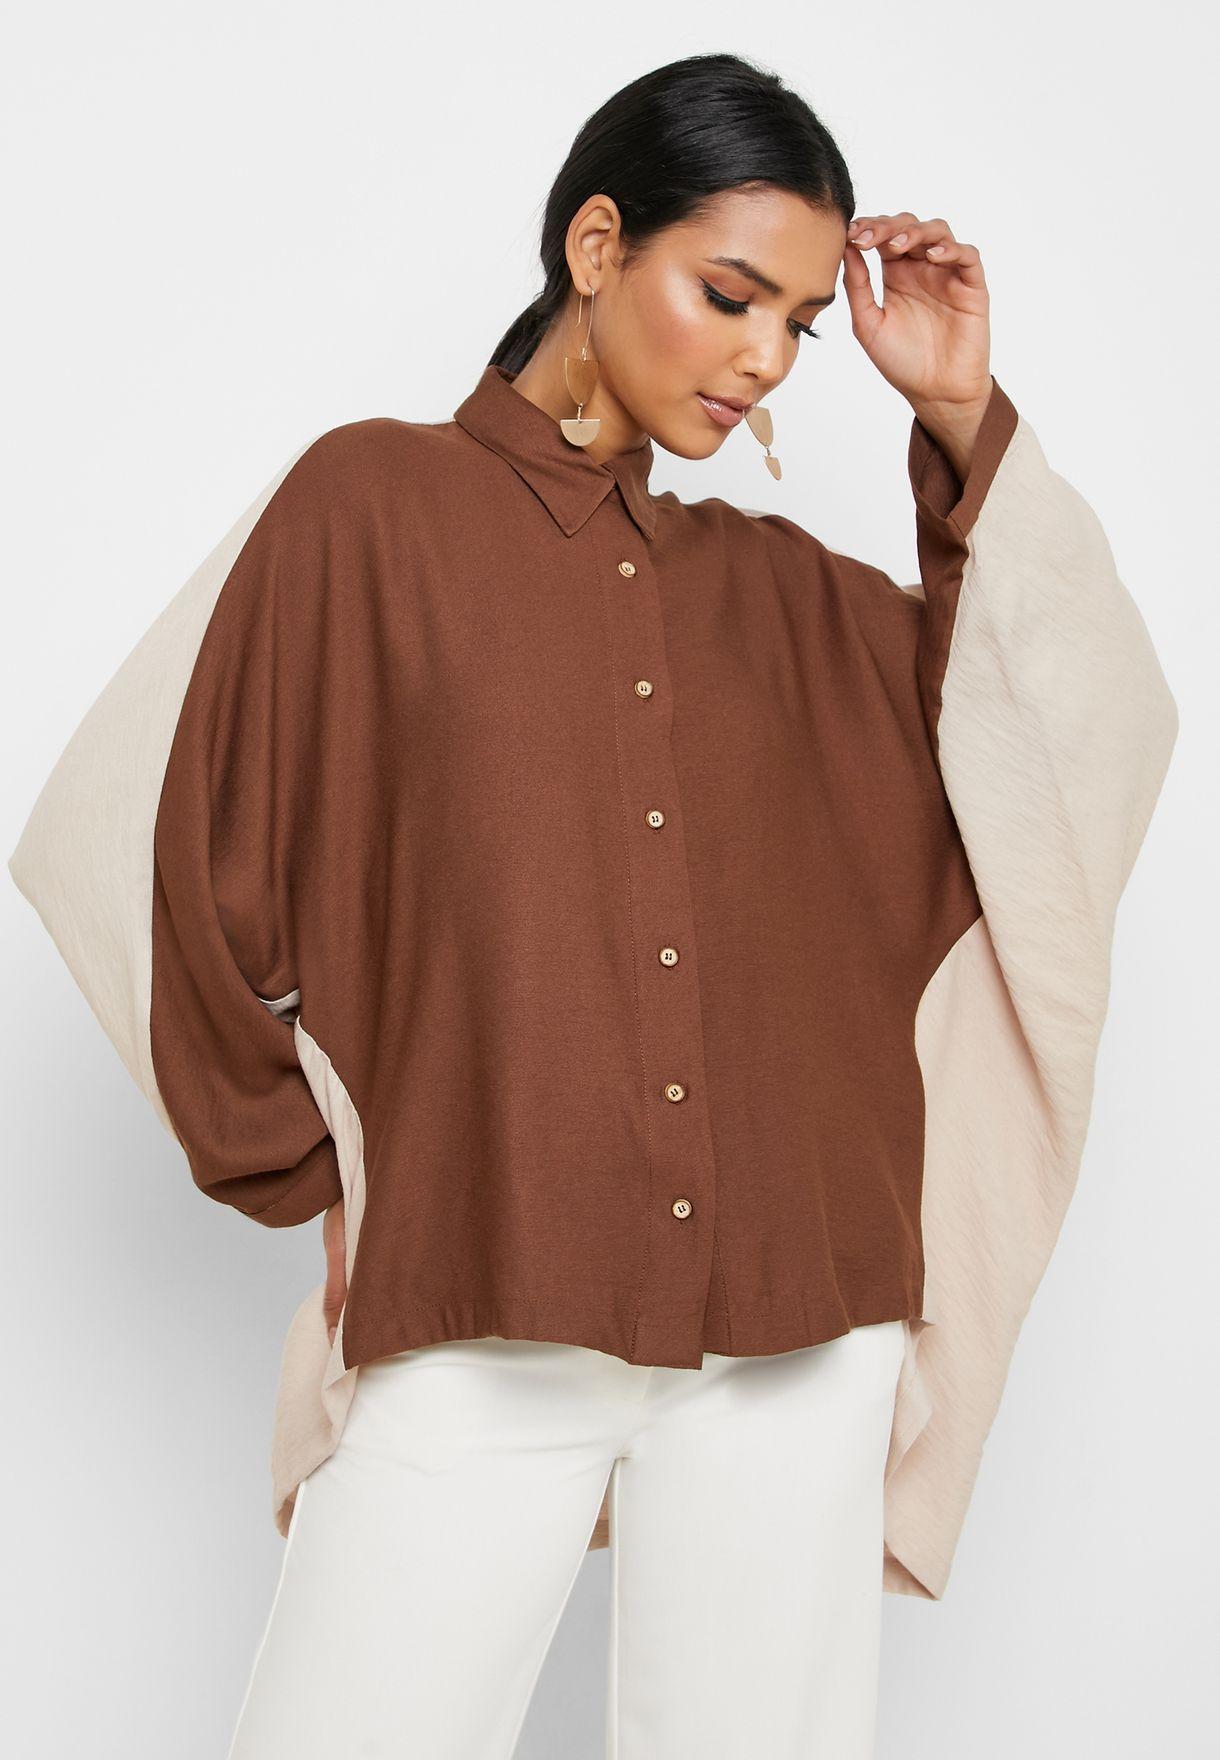 Colorblock Asymmetric Shirt